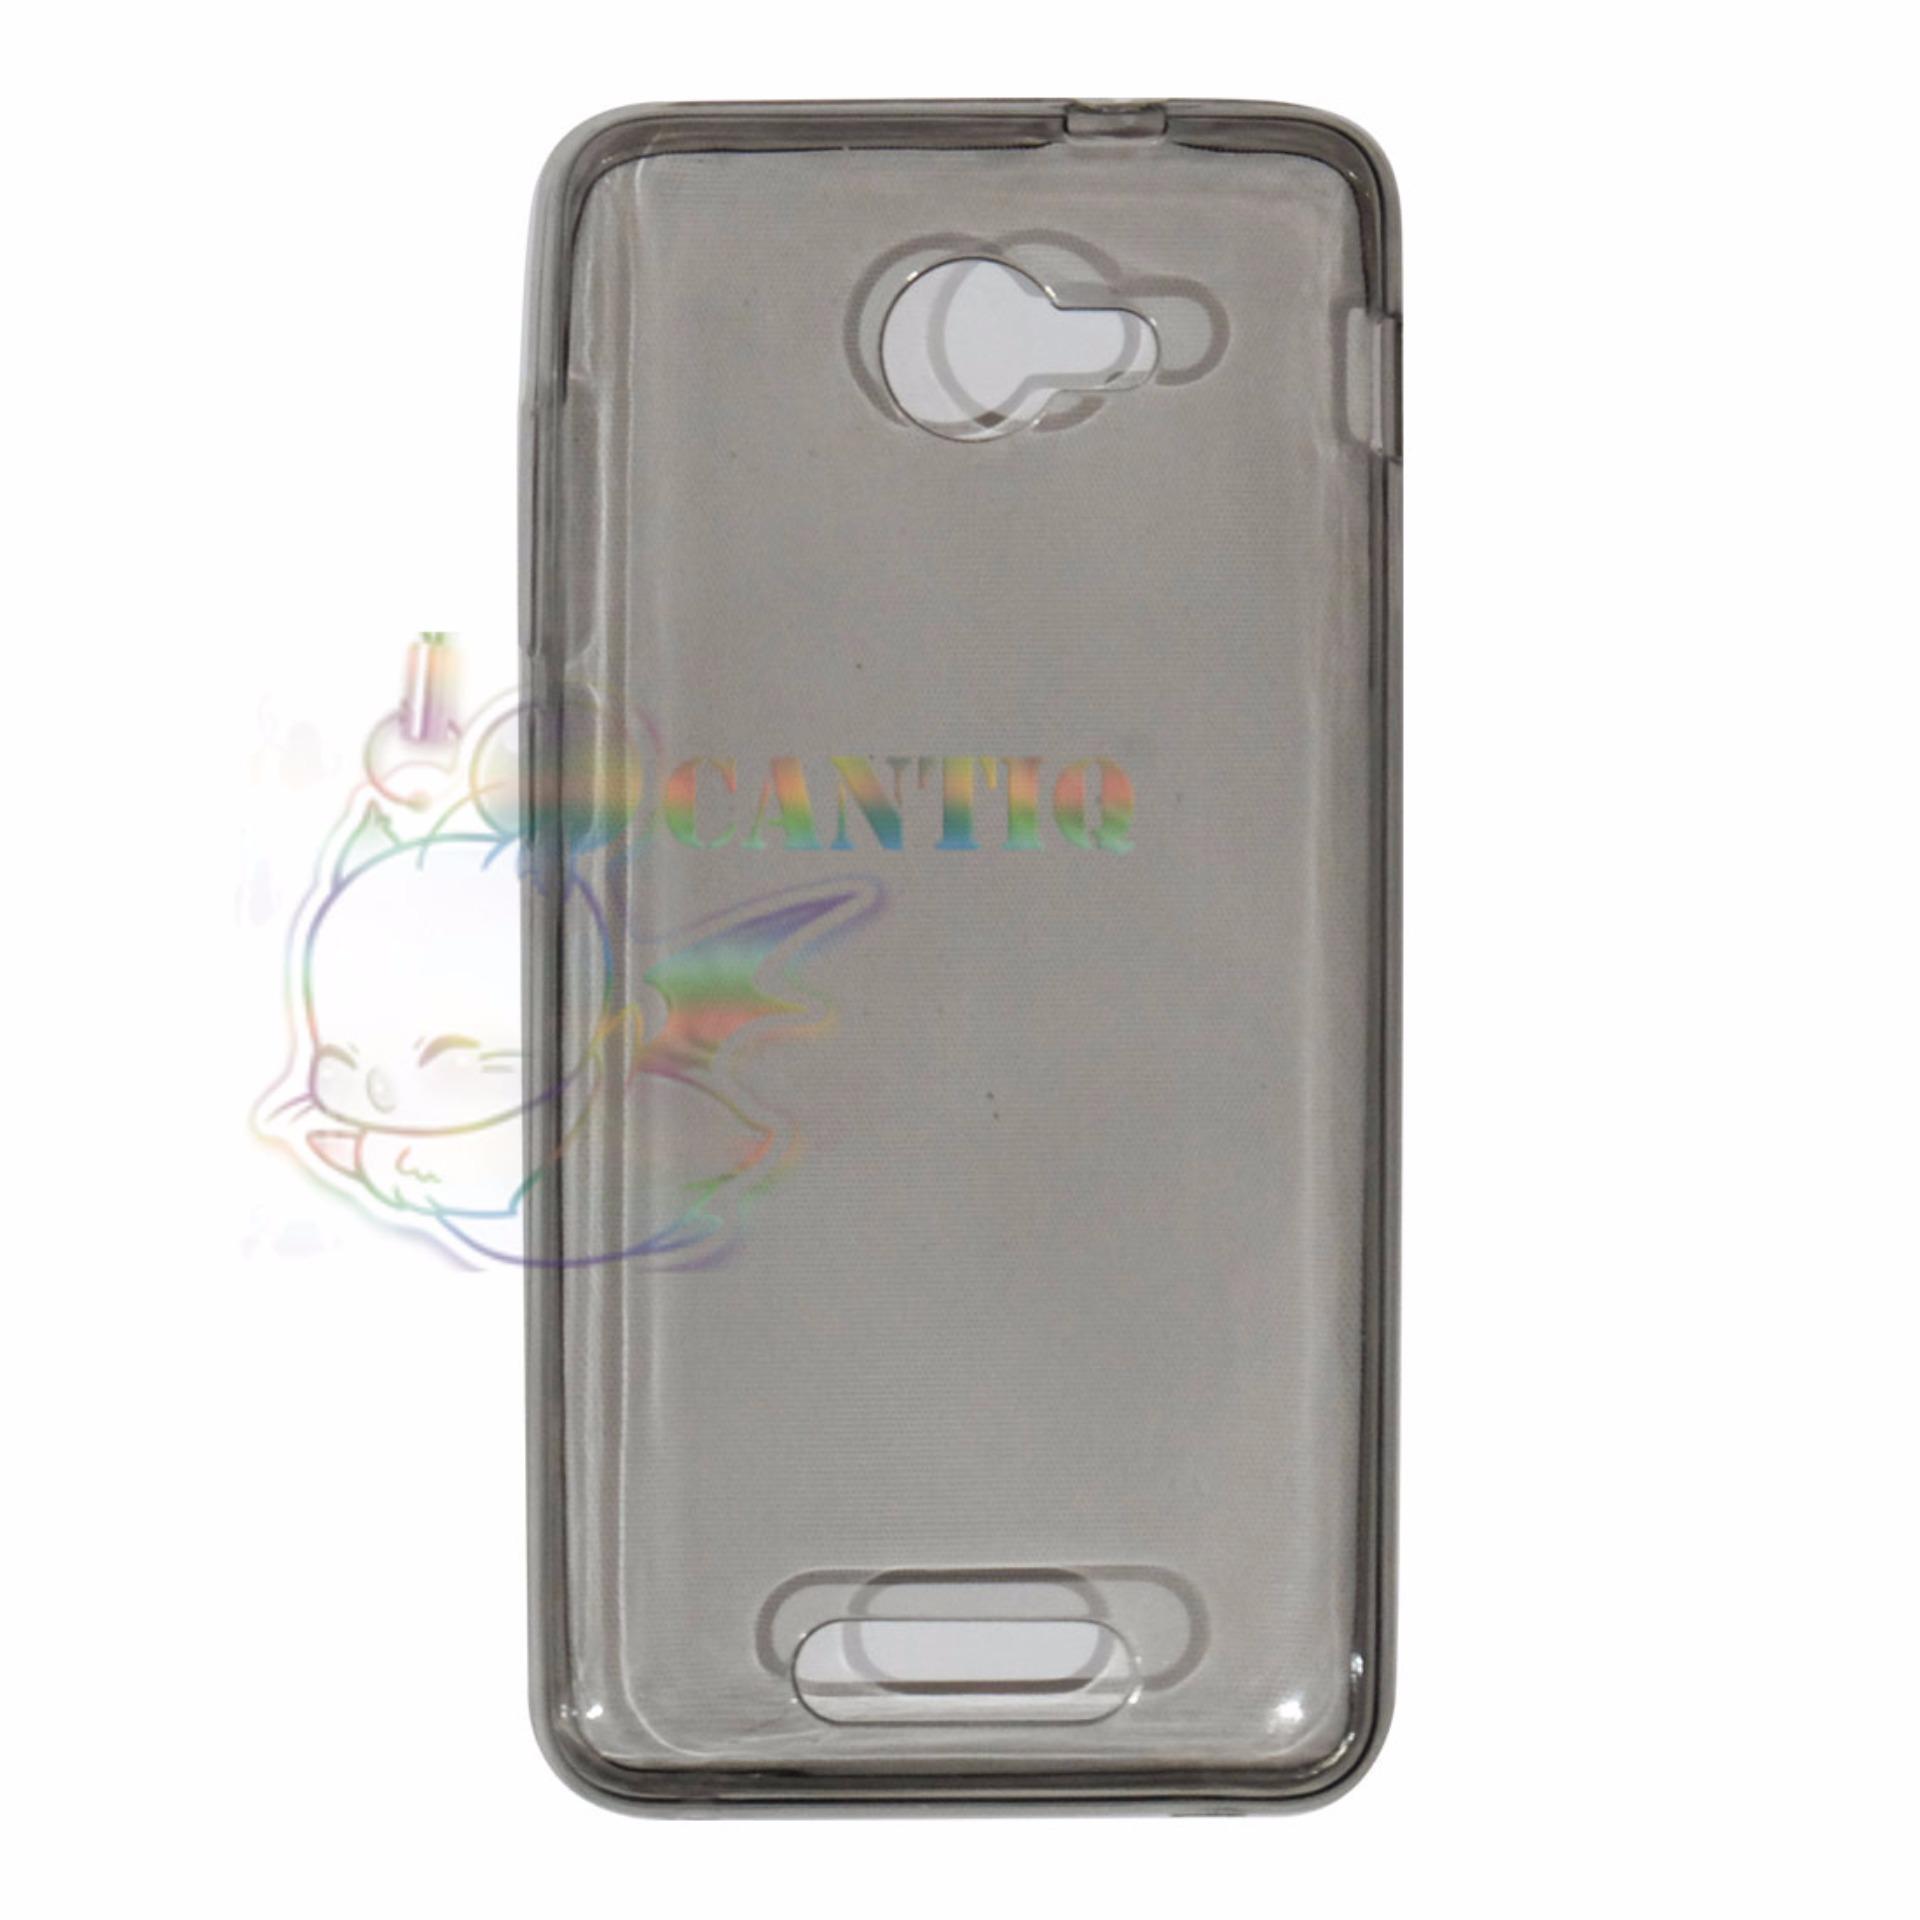 ... QCF Ultrathin Case Untuk Andromax B Ultrafit / Silicone Jelly Case/ SoftCase - Hitam ...